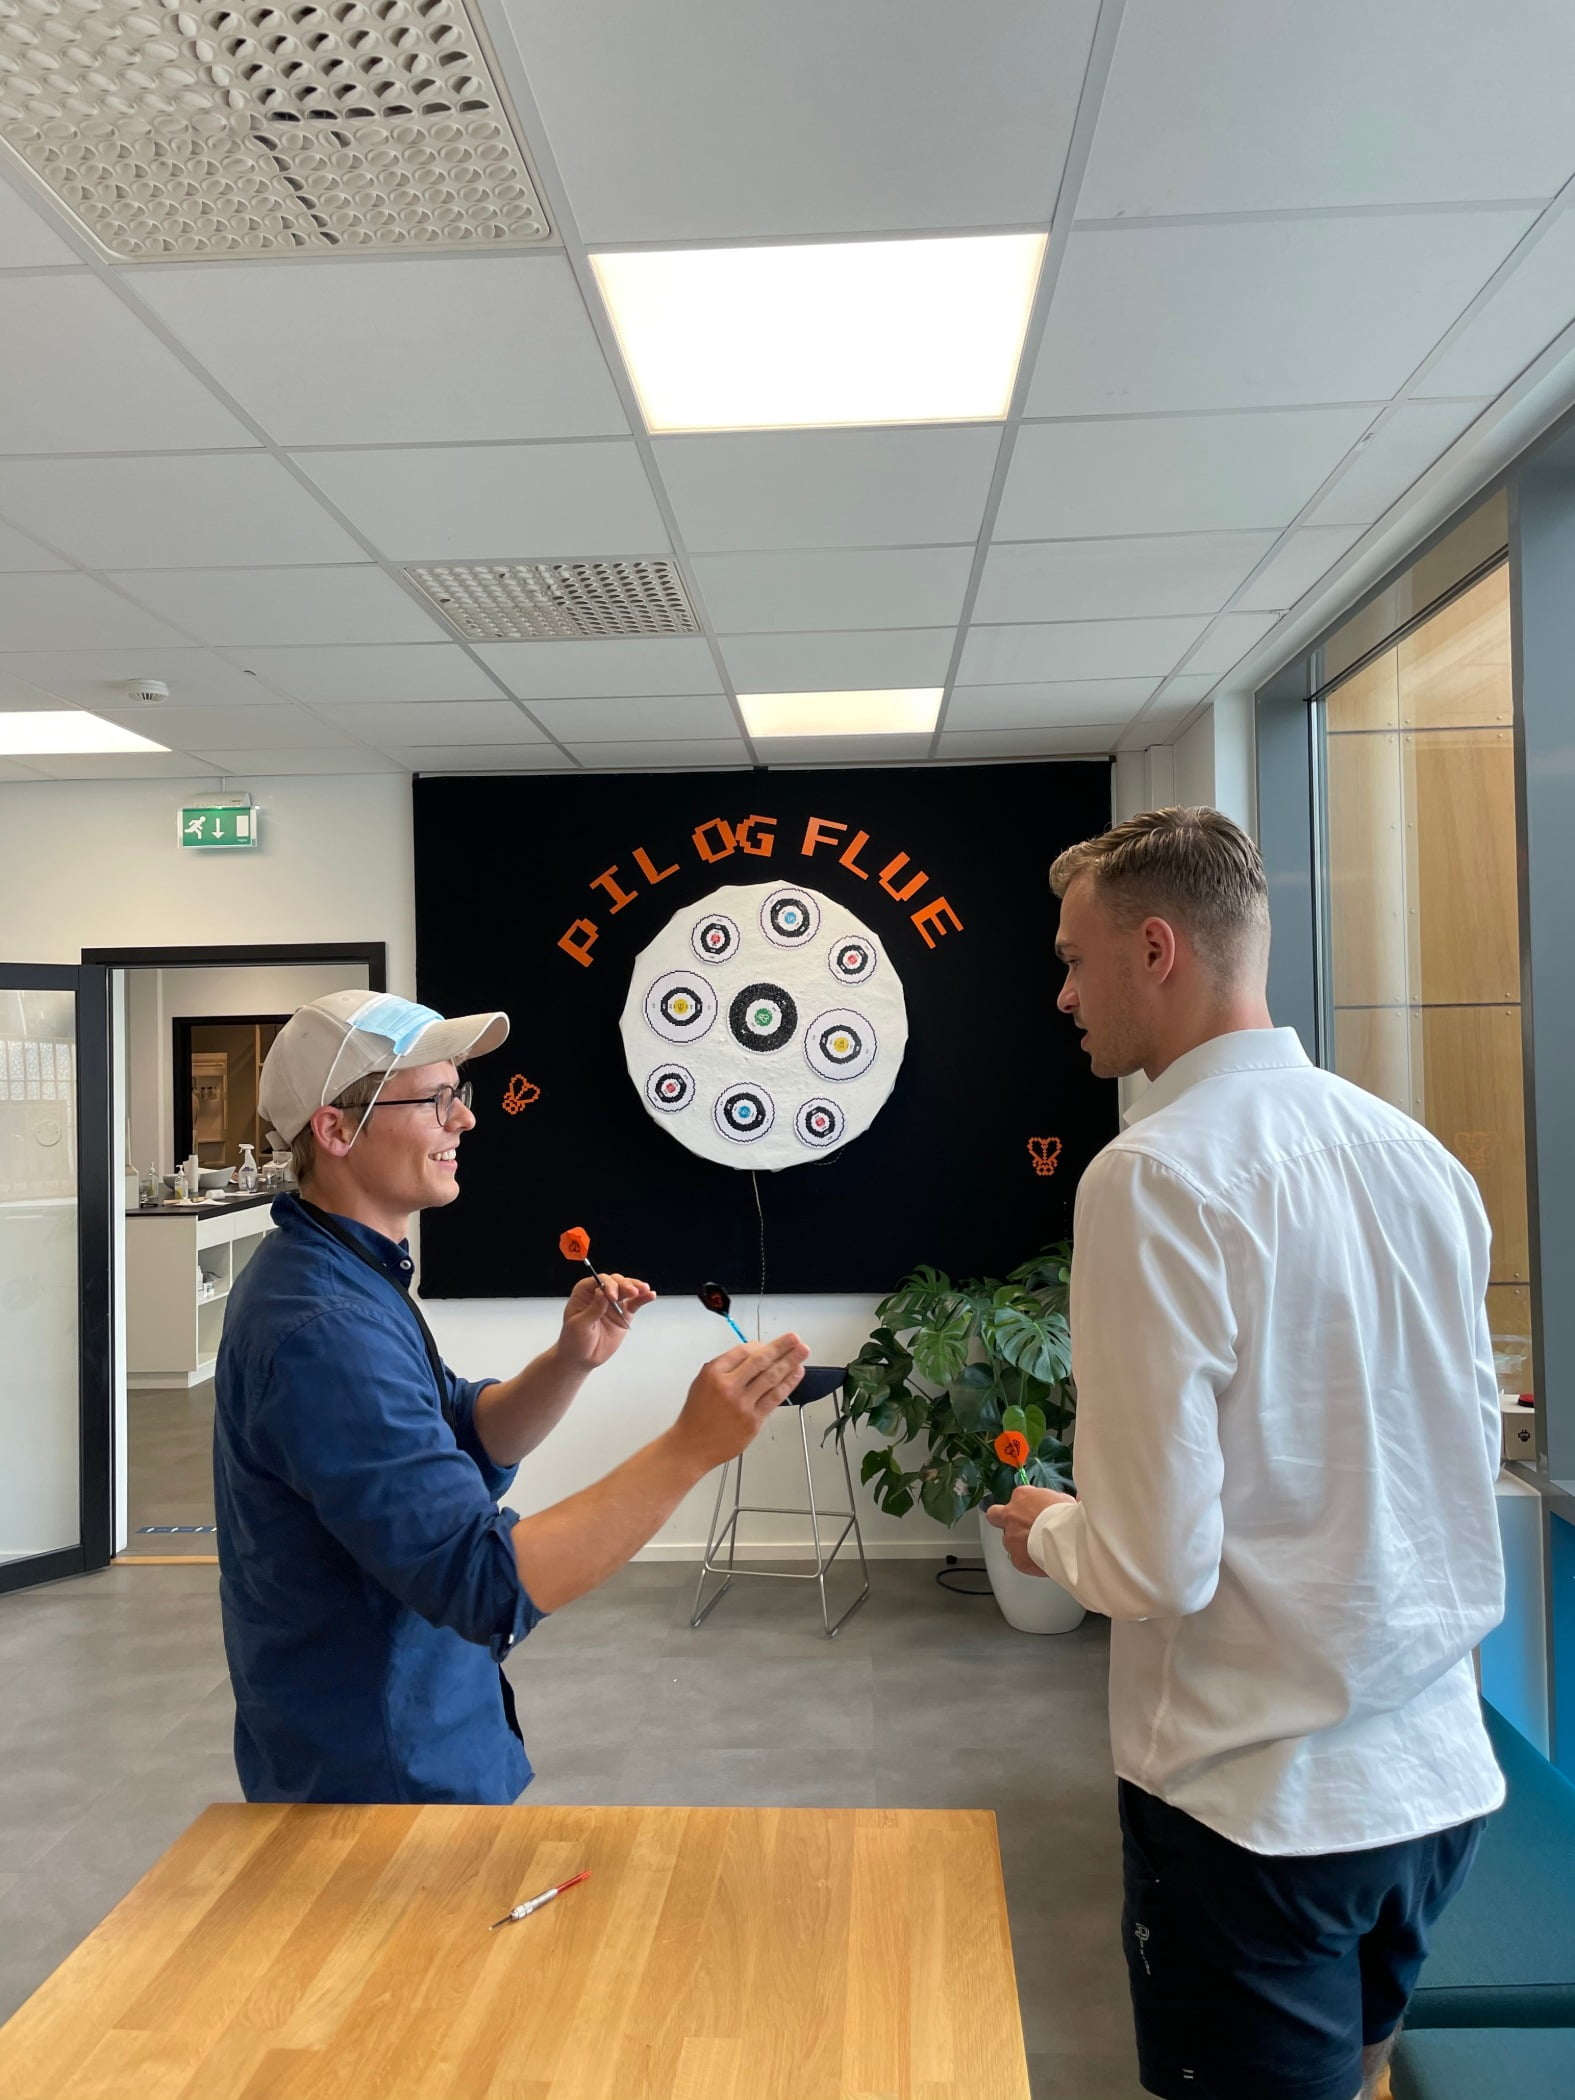 Interior design, Wheel, Table, Orange, Gesture